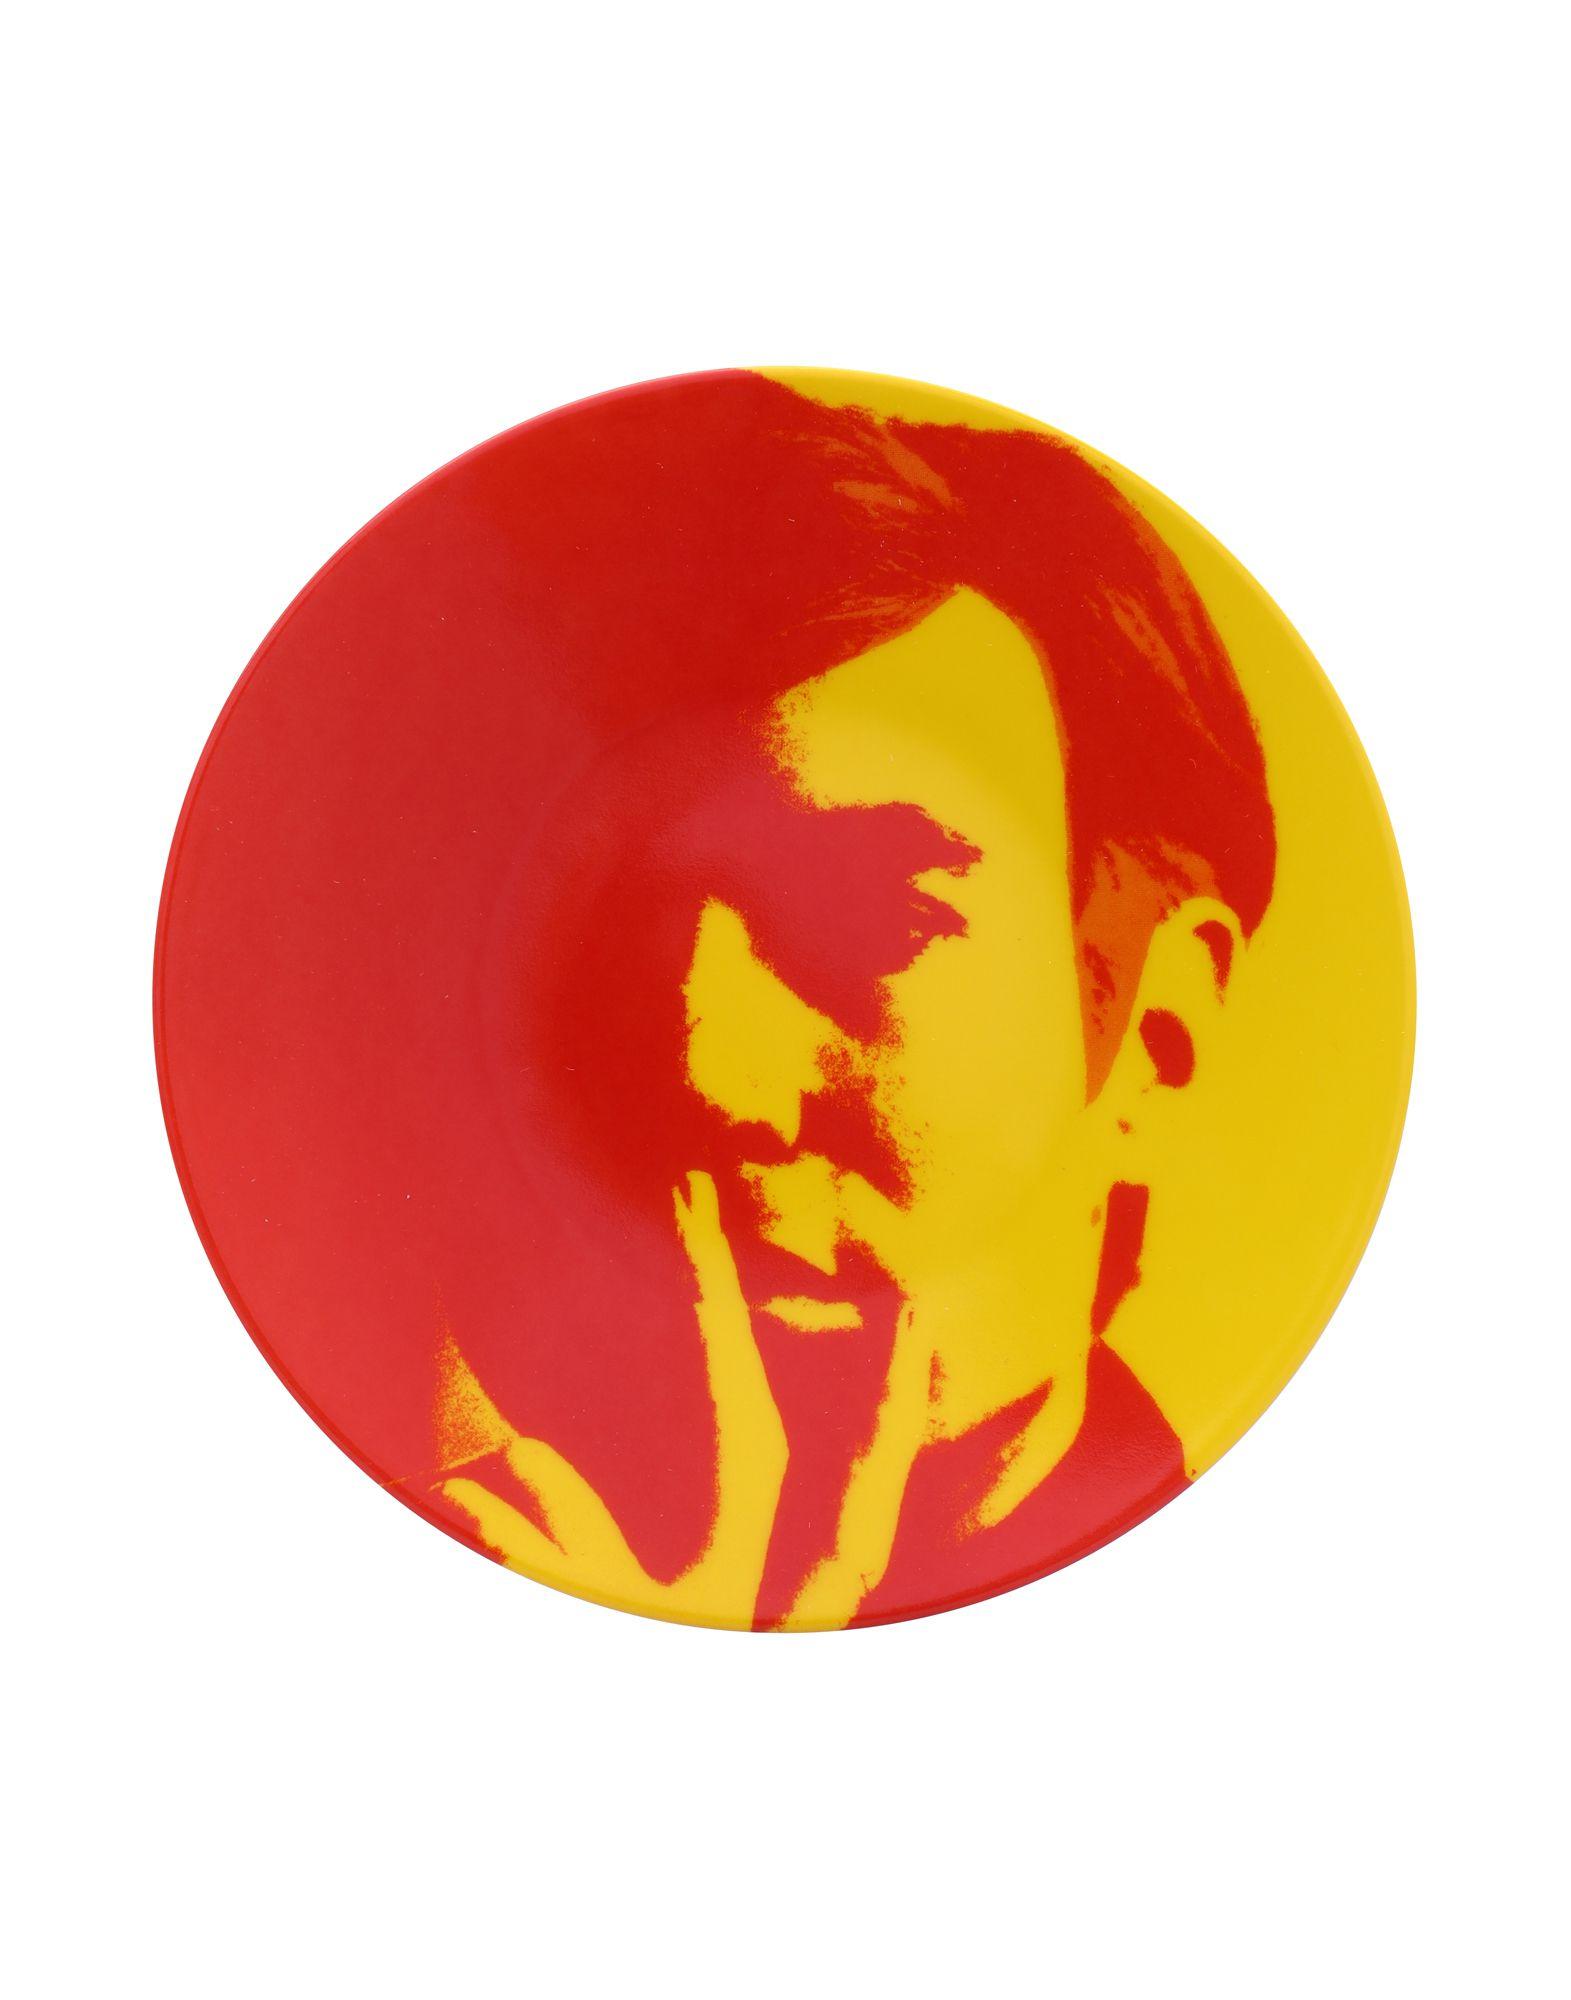 Andy-Warhol5